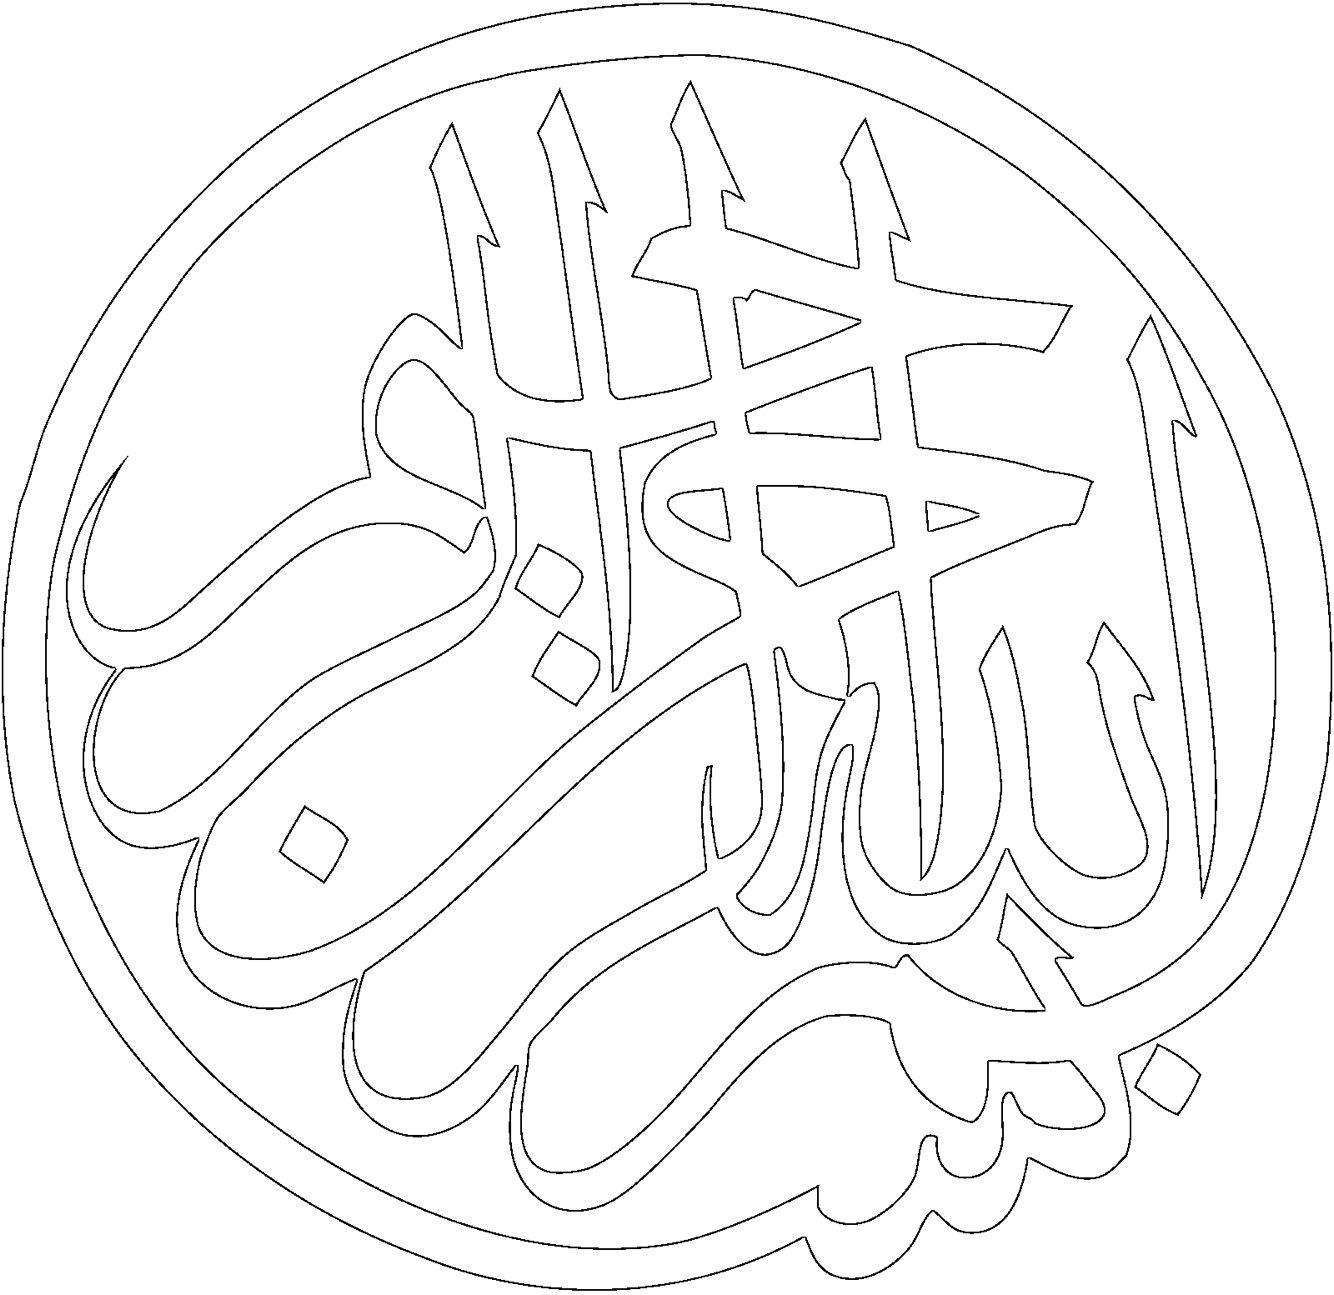 Pin Oleh Nadeen Di Tezhip Seni Kaligrafi Buku Mewarnai Seni Kaligrafi Arab